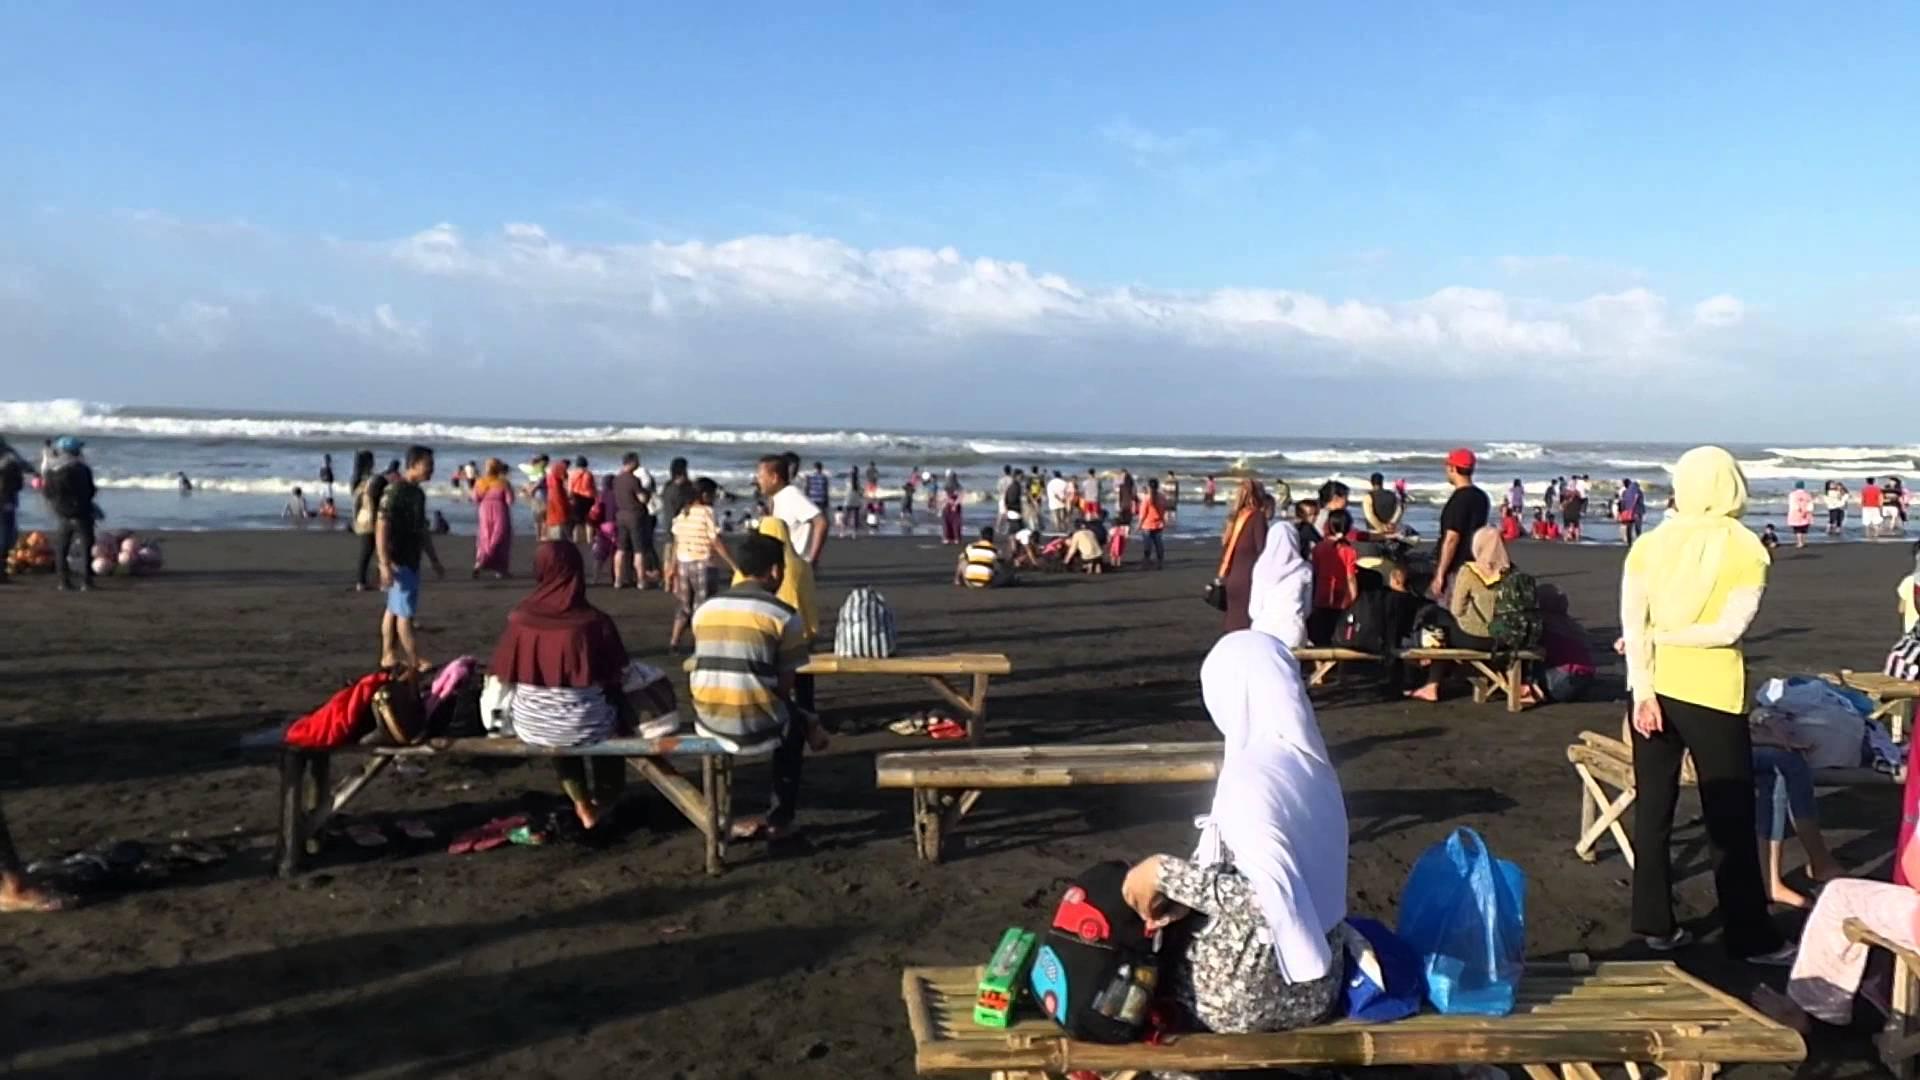 Suasana Libur Lebaran Pantai Widara Payung Youtube Widarapayung Kab Cilacap